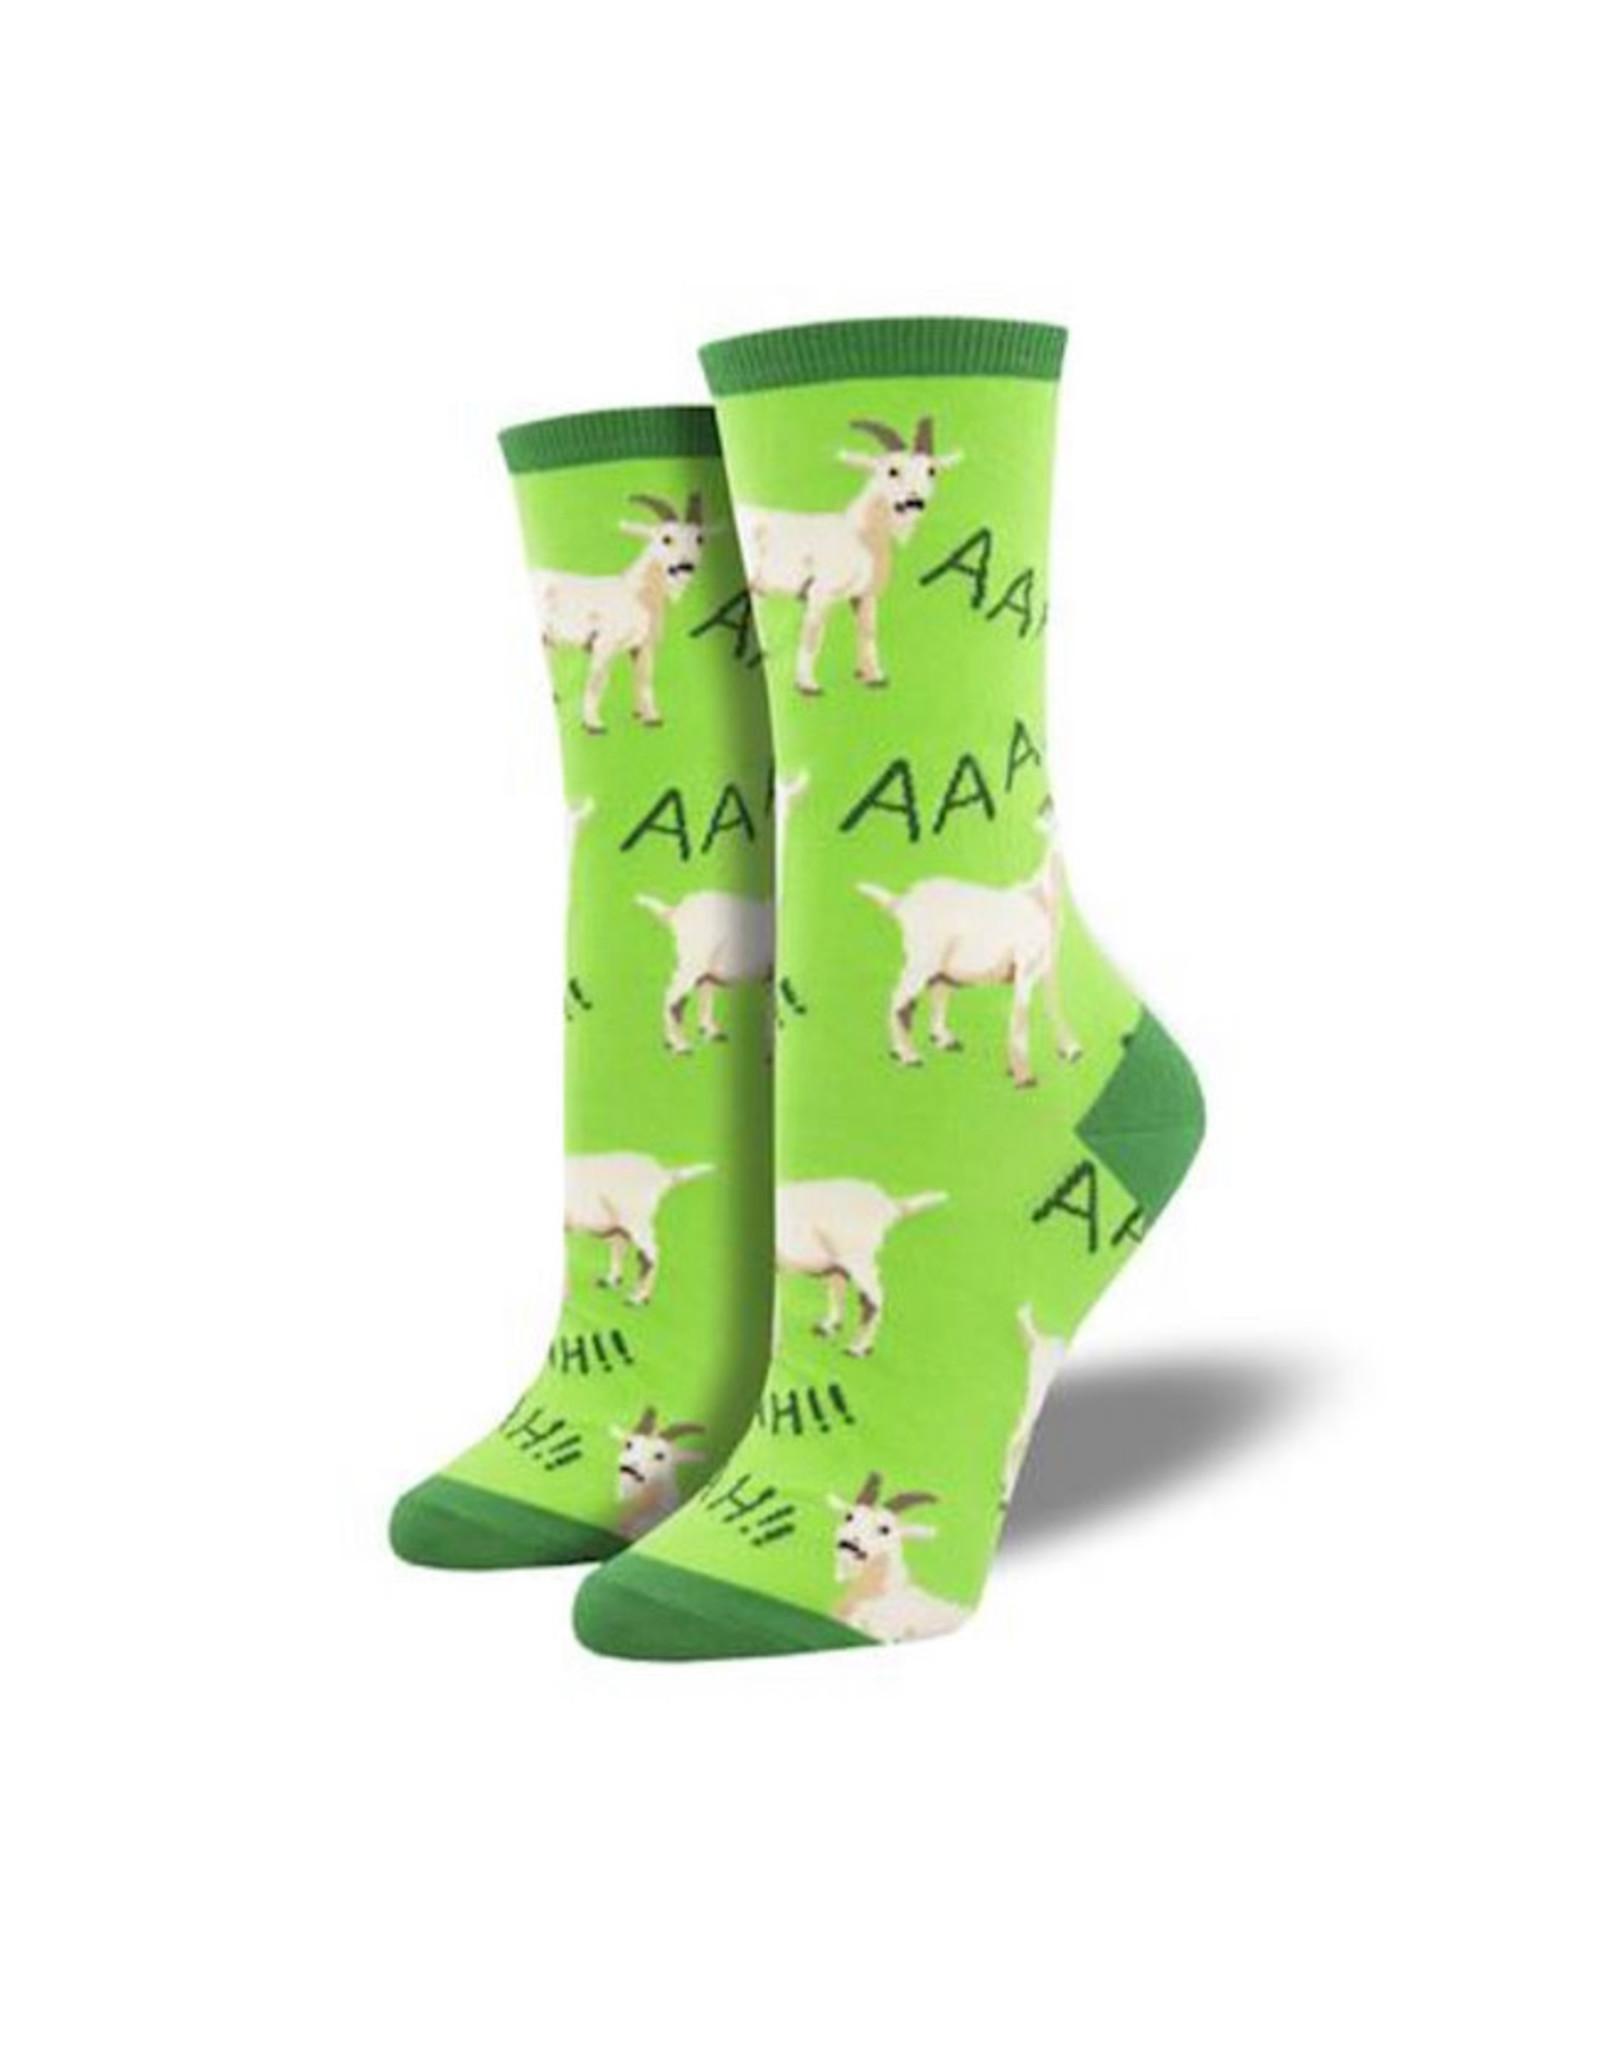 Socks (Womens) - Screaming Goats